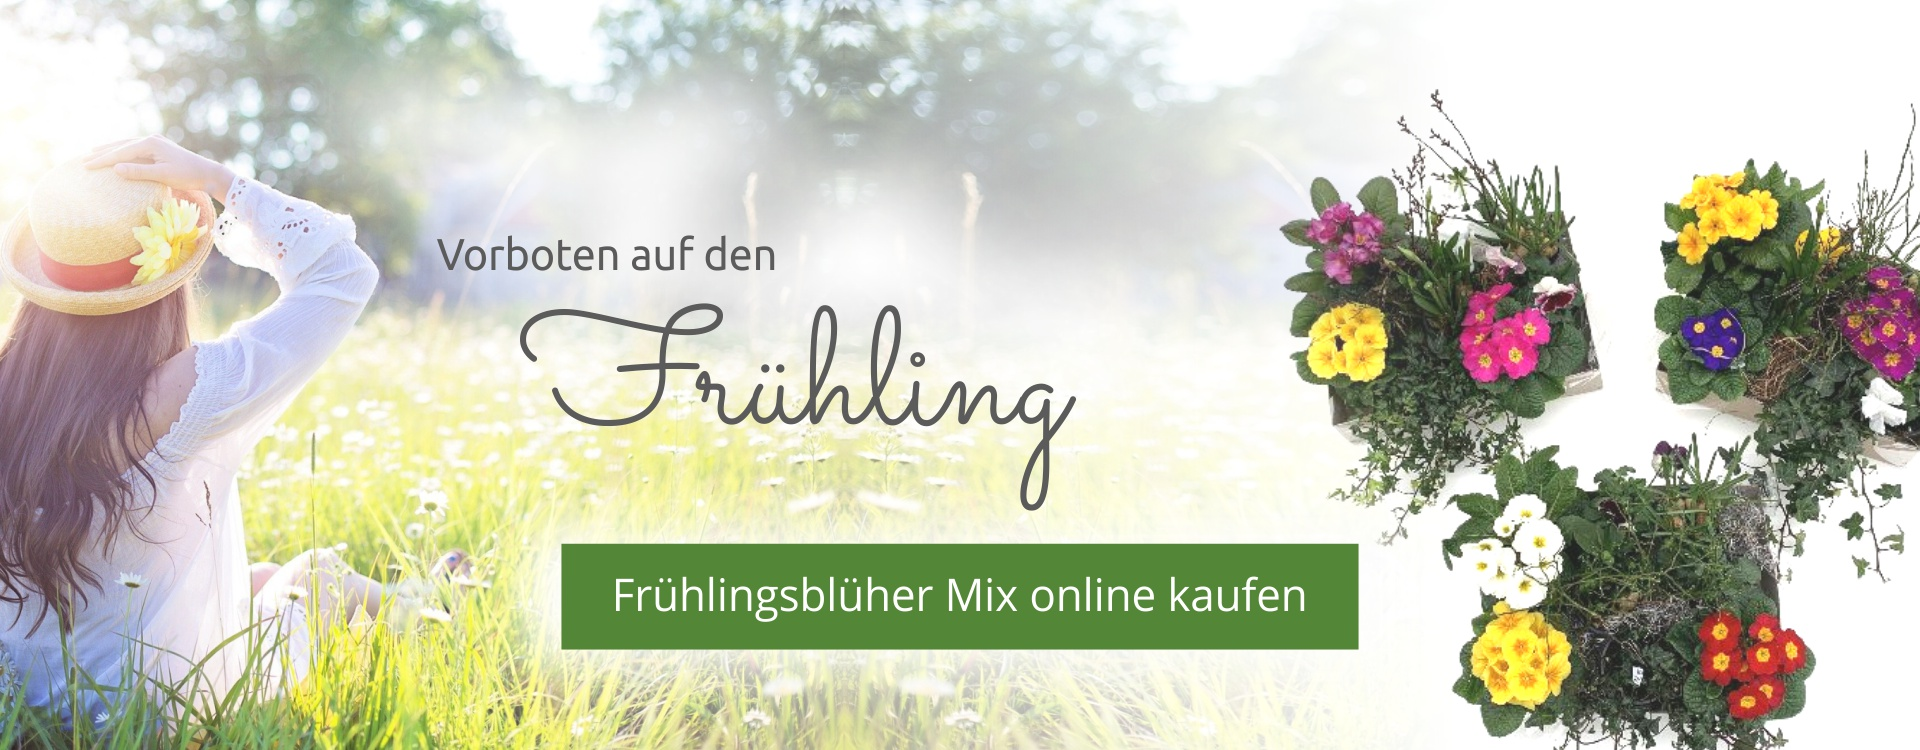 Frühlingsvorboten,Frühlingsschalen1920x750